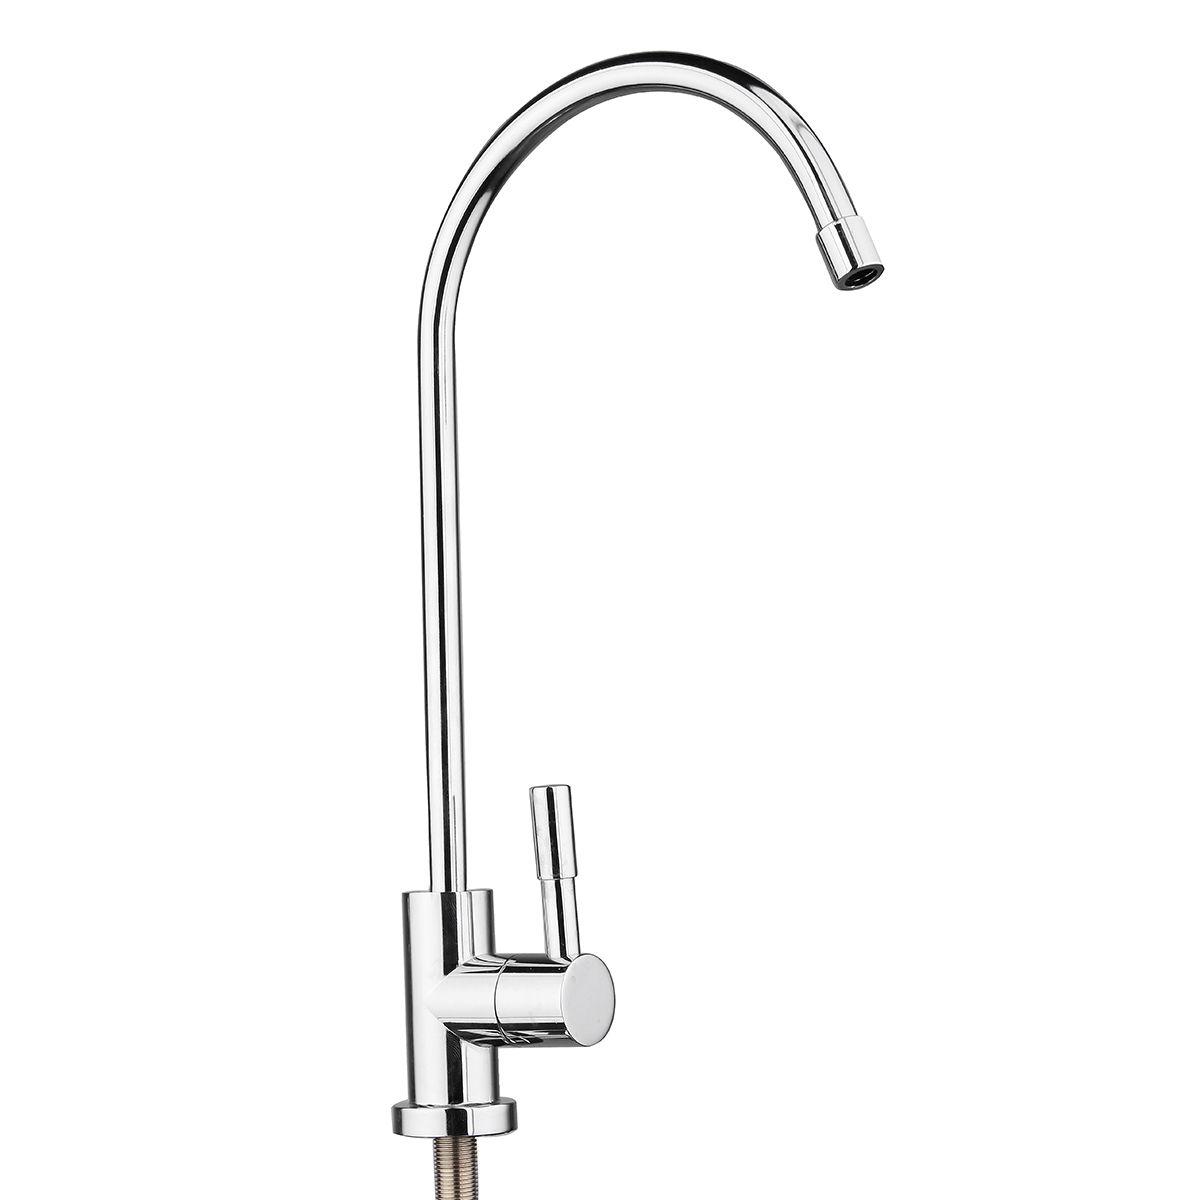 1 4 Reverse Bathroom Kitchen 360 Degree Drinking Water Filter